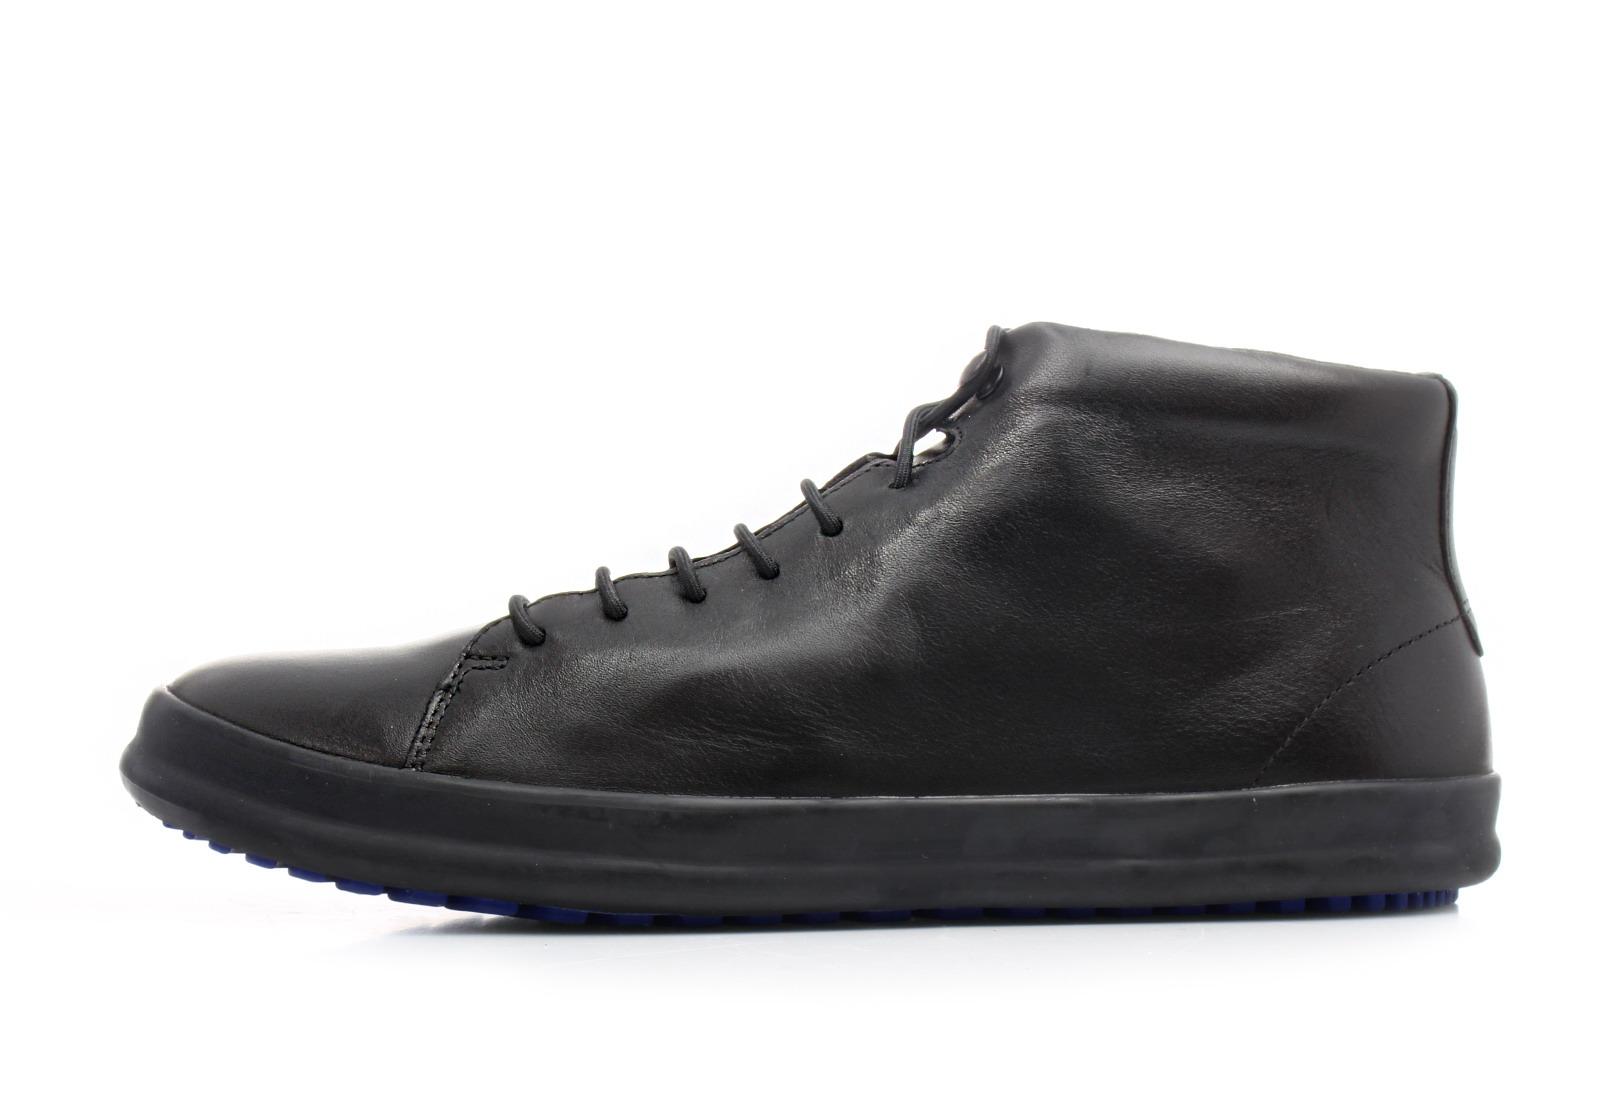 Chasis Sneakers Shoes For Camper K300236 Shop Sport Online 003 0vnOmN8w